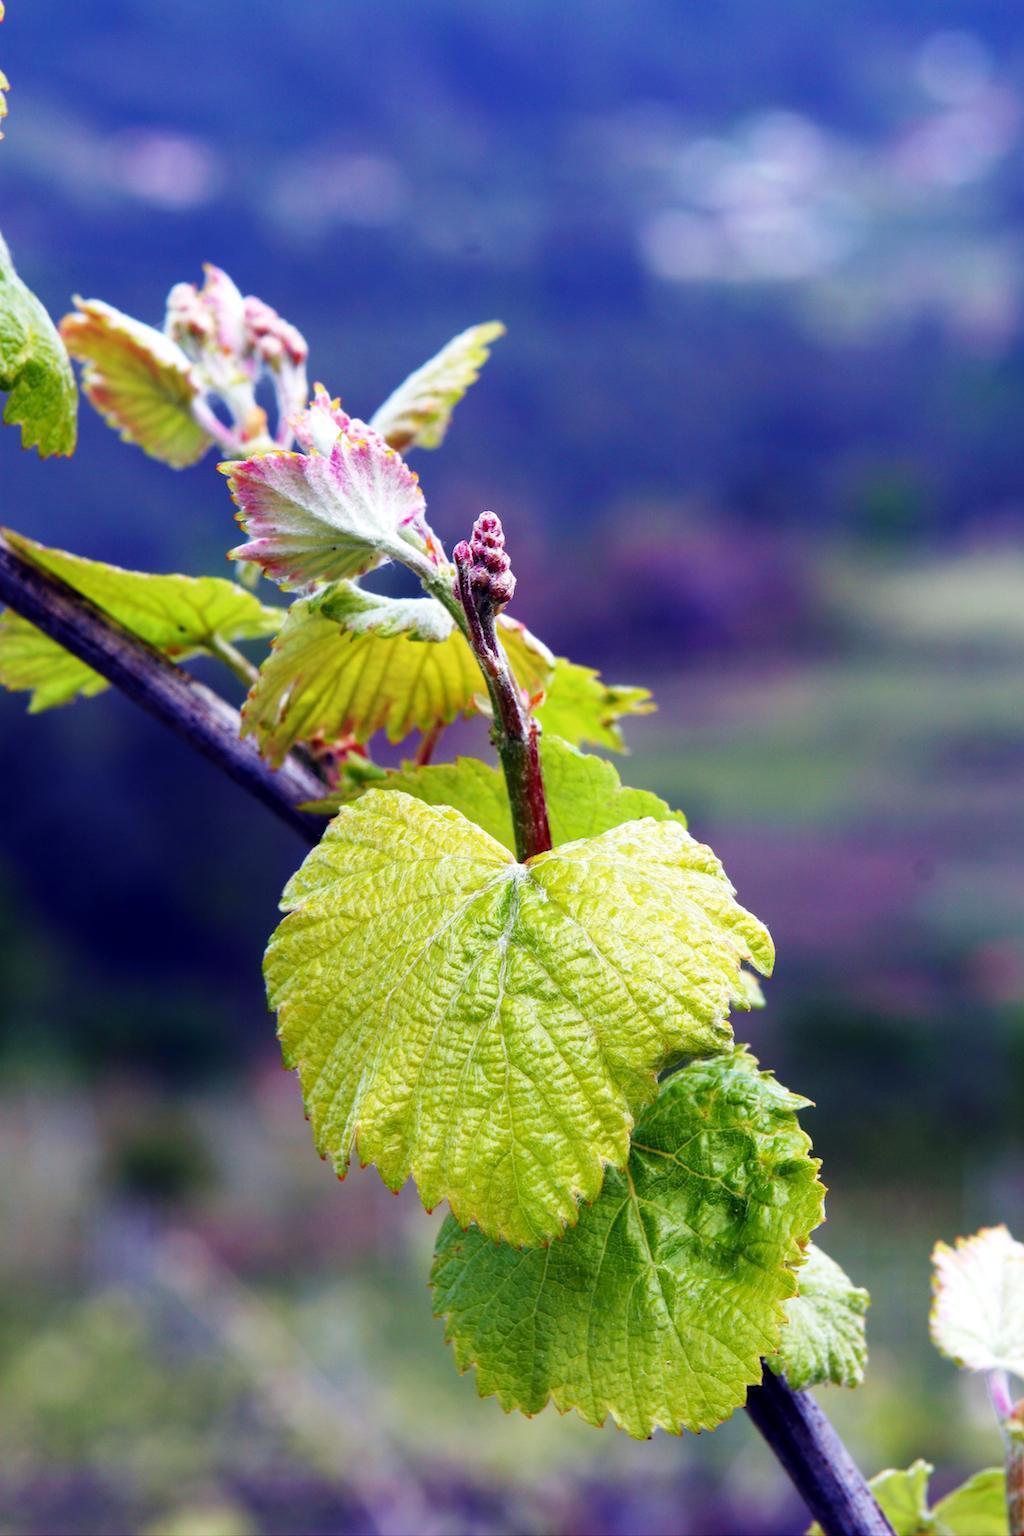 vinhos-verdes